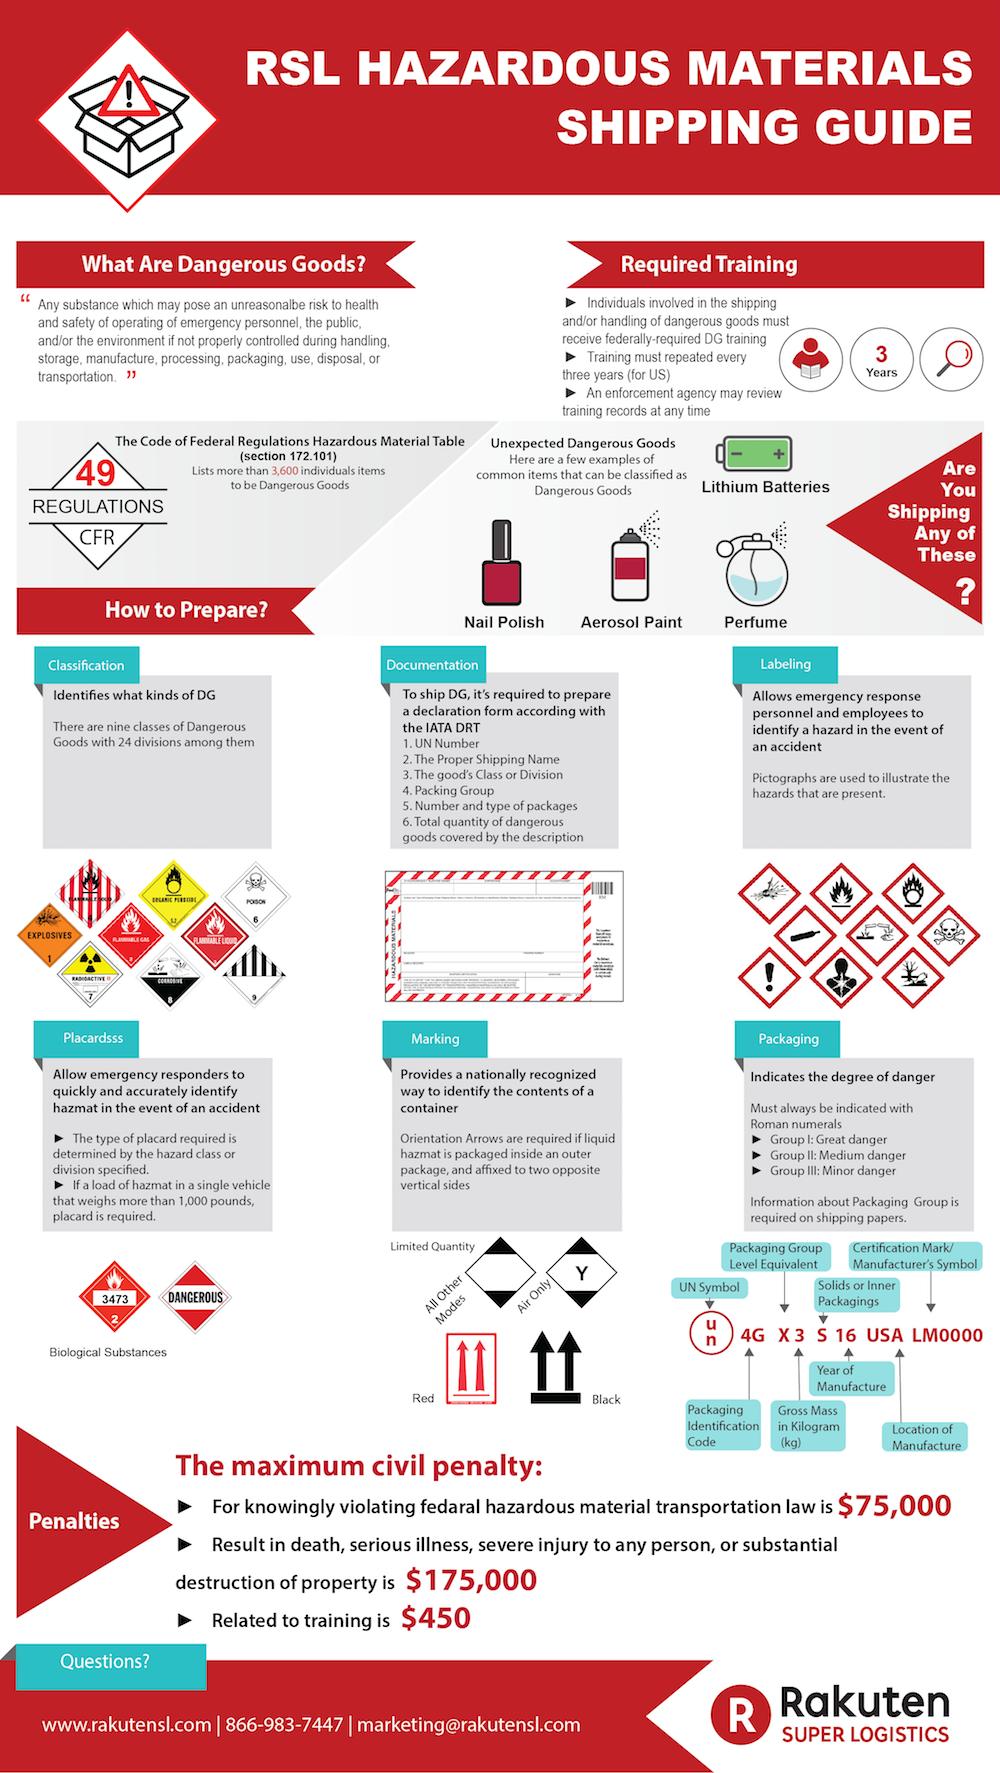 RSL Hazardous Materials Shipping Guide